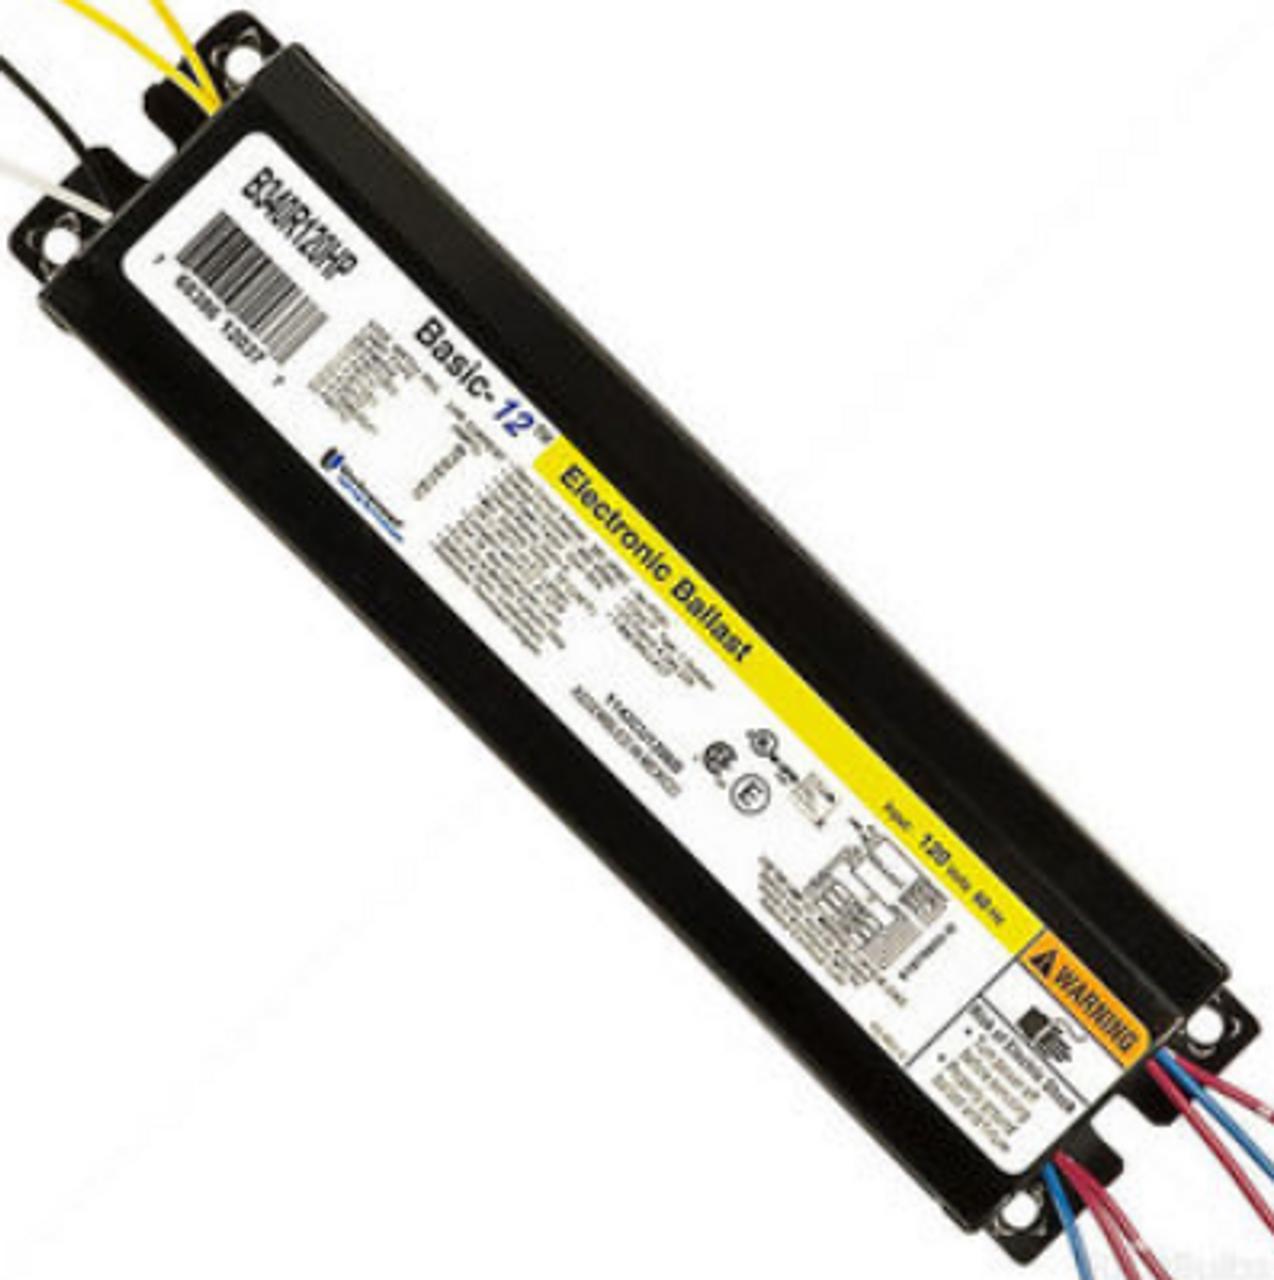 New Sola T12 Fluorescent Lighting Ballasts 8